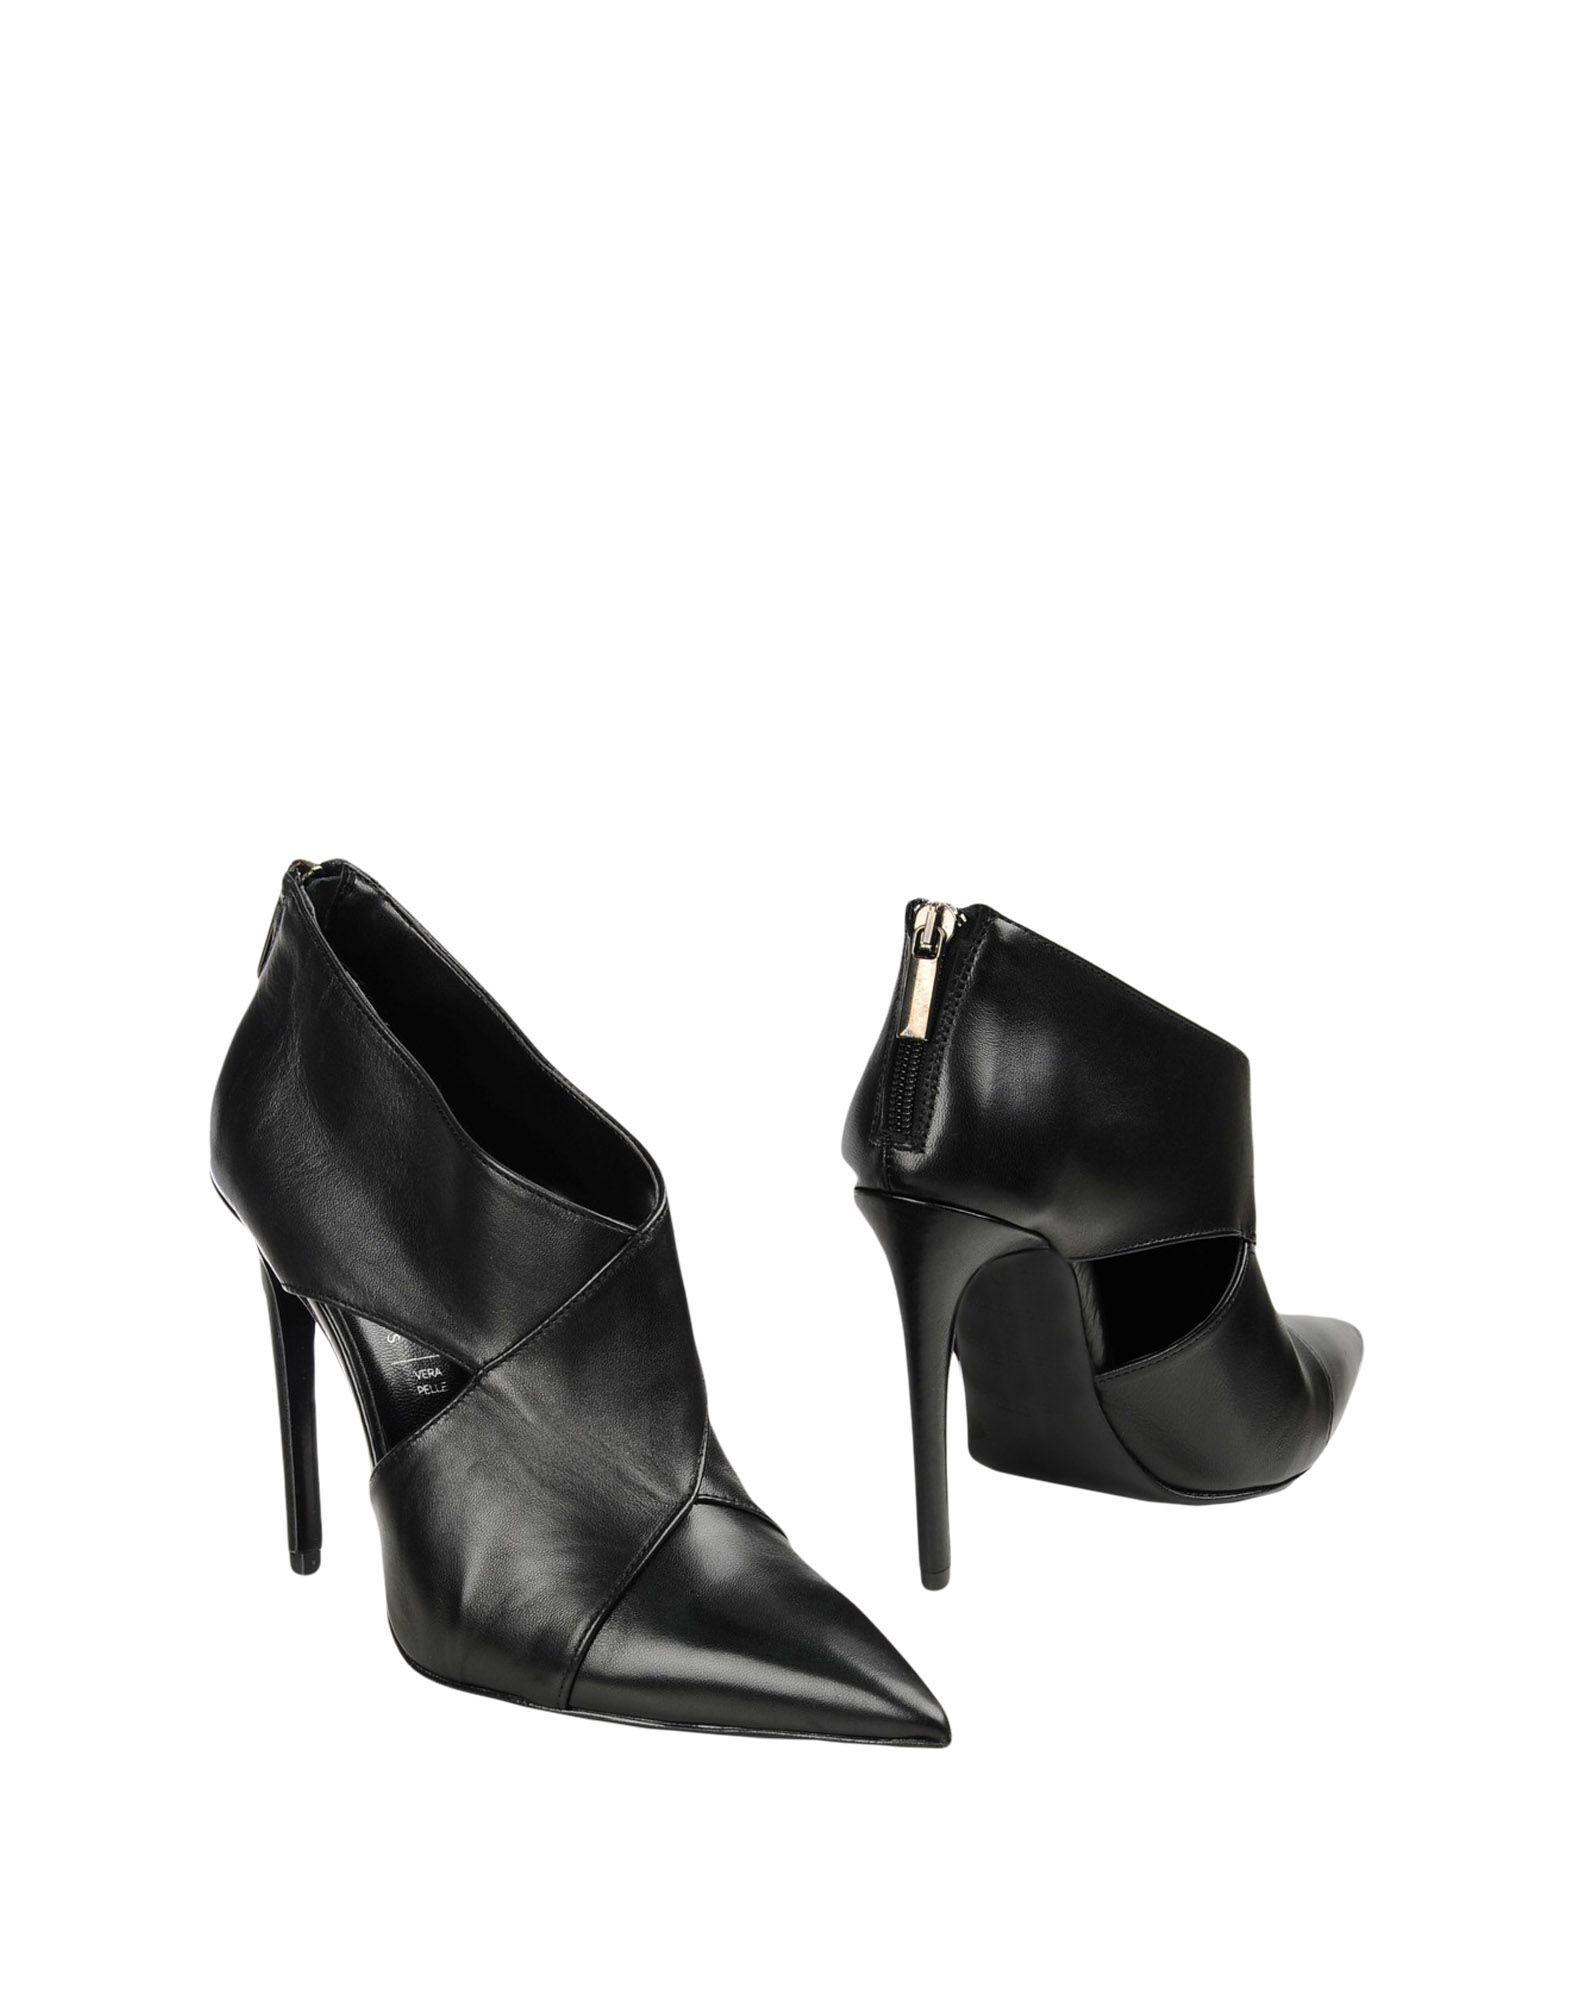 Jolie Spiers By Edward Spiers Jolie Stiefelette Damen  11423754SJ Gute Qualität beliebte Schuhe 06f46c